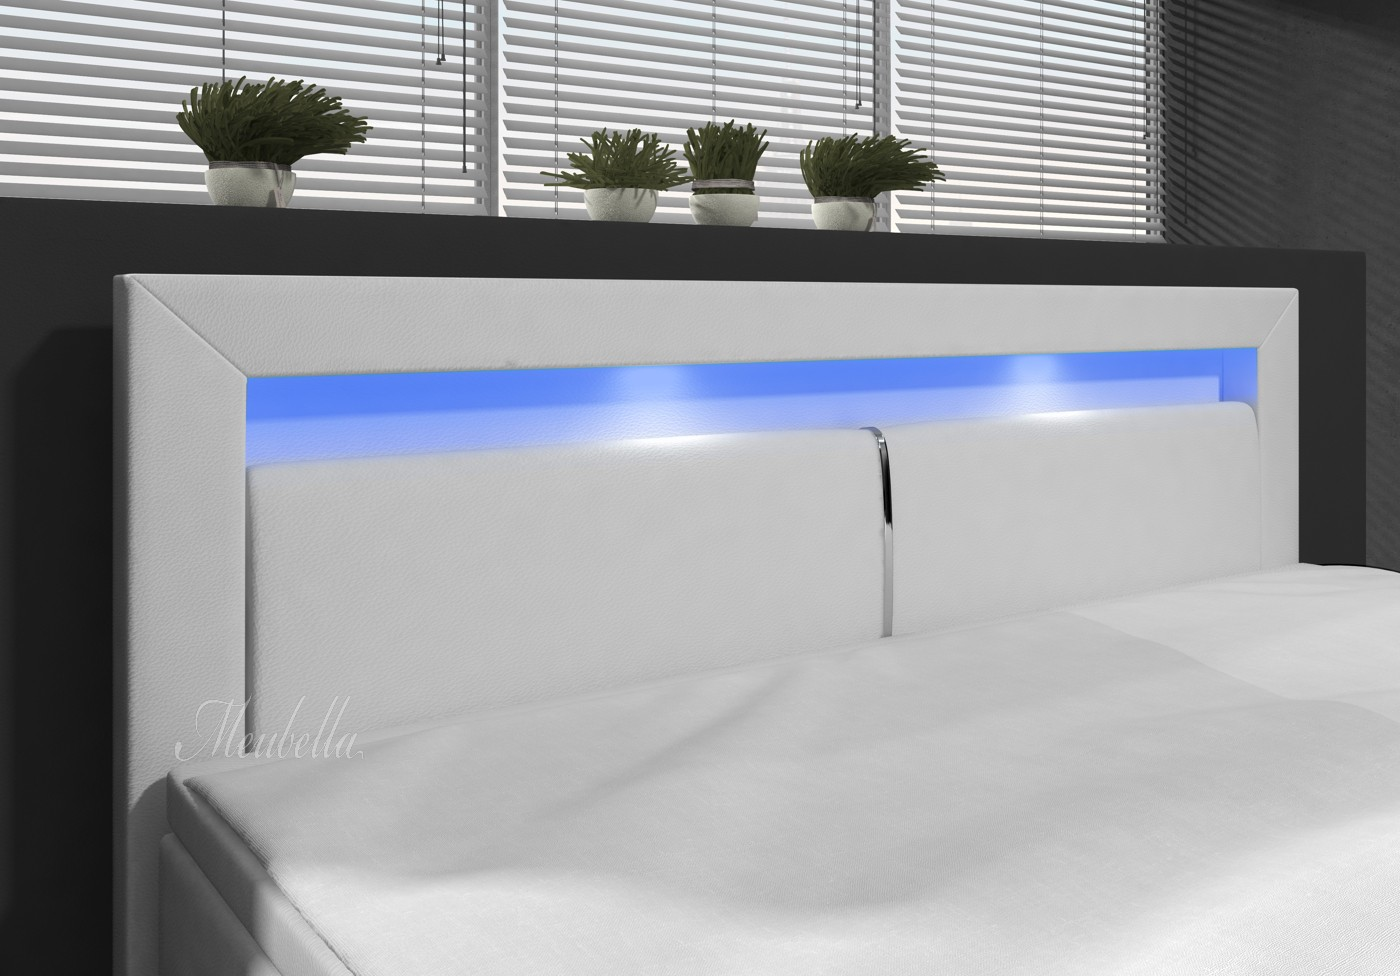 boxspring matratze 140x200 box spring bed 160x200 cm pu leather king size ikea box spring. Black Bedroom Furniture Sets. Home Design Ideas